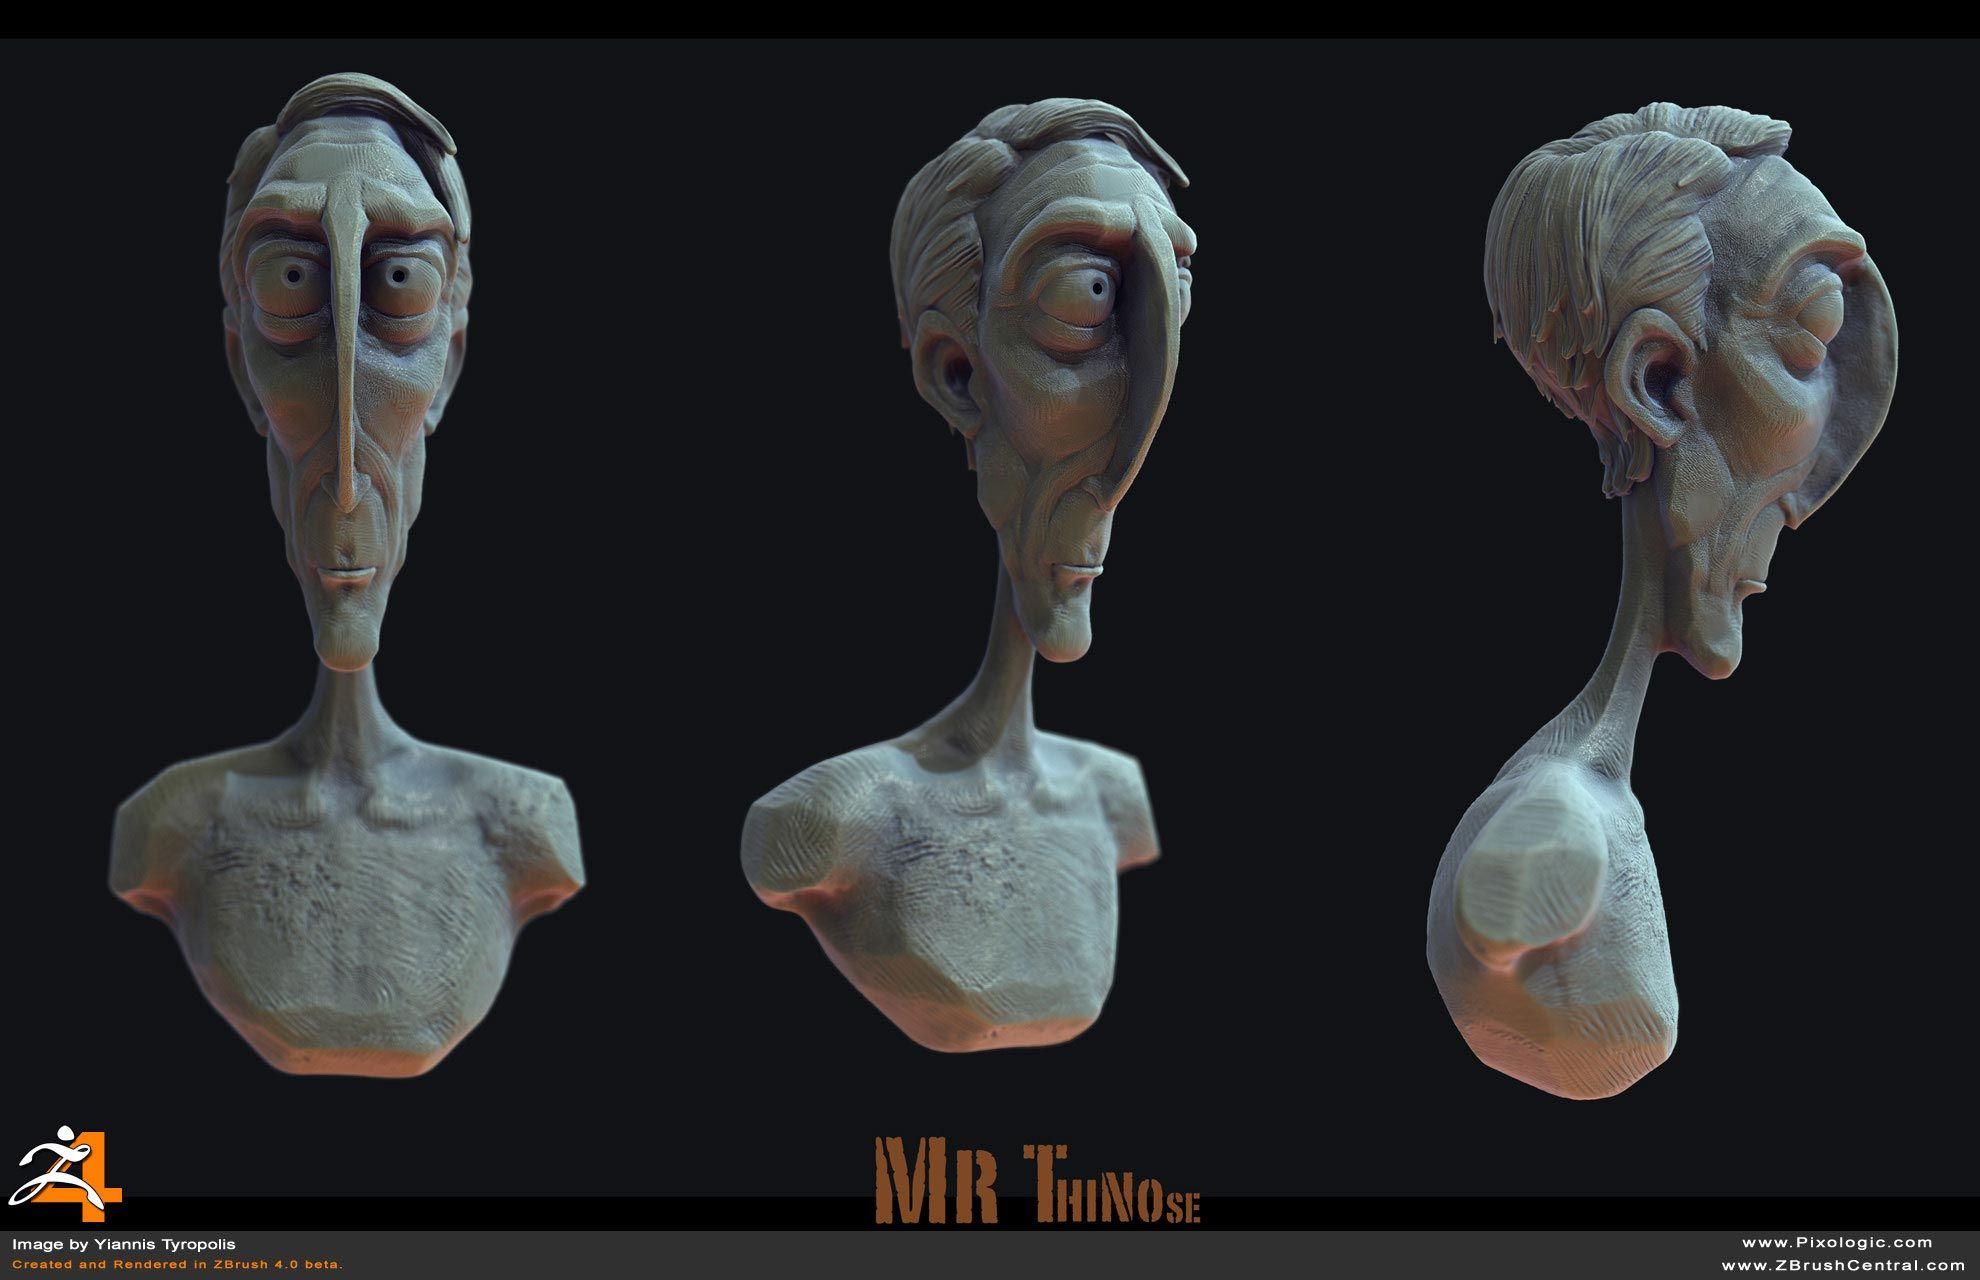 Zbrush Vs Mudbox Zbrush Vs Mudbox | www...